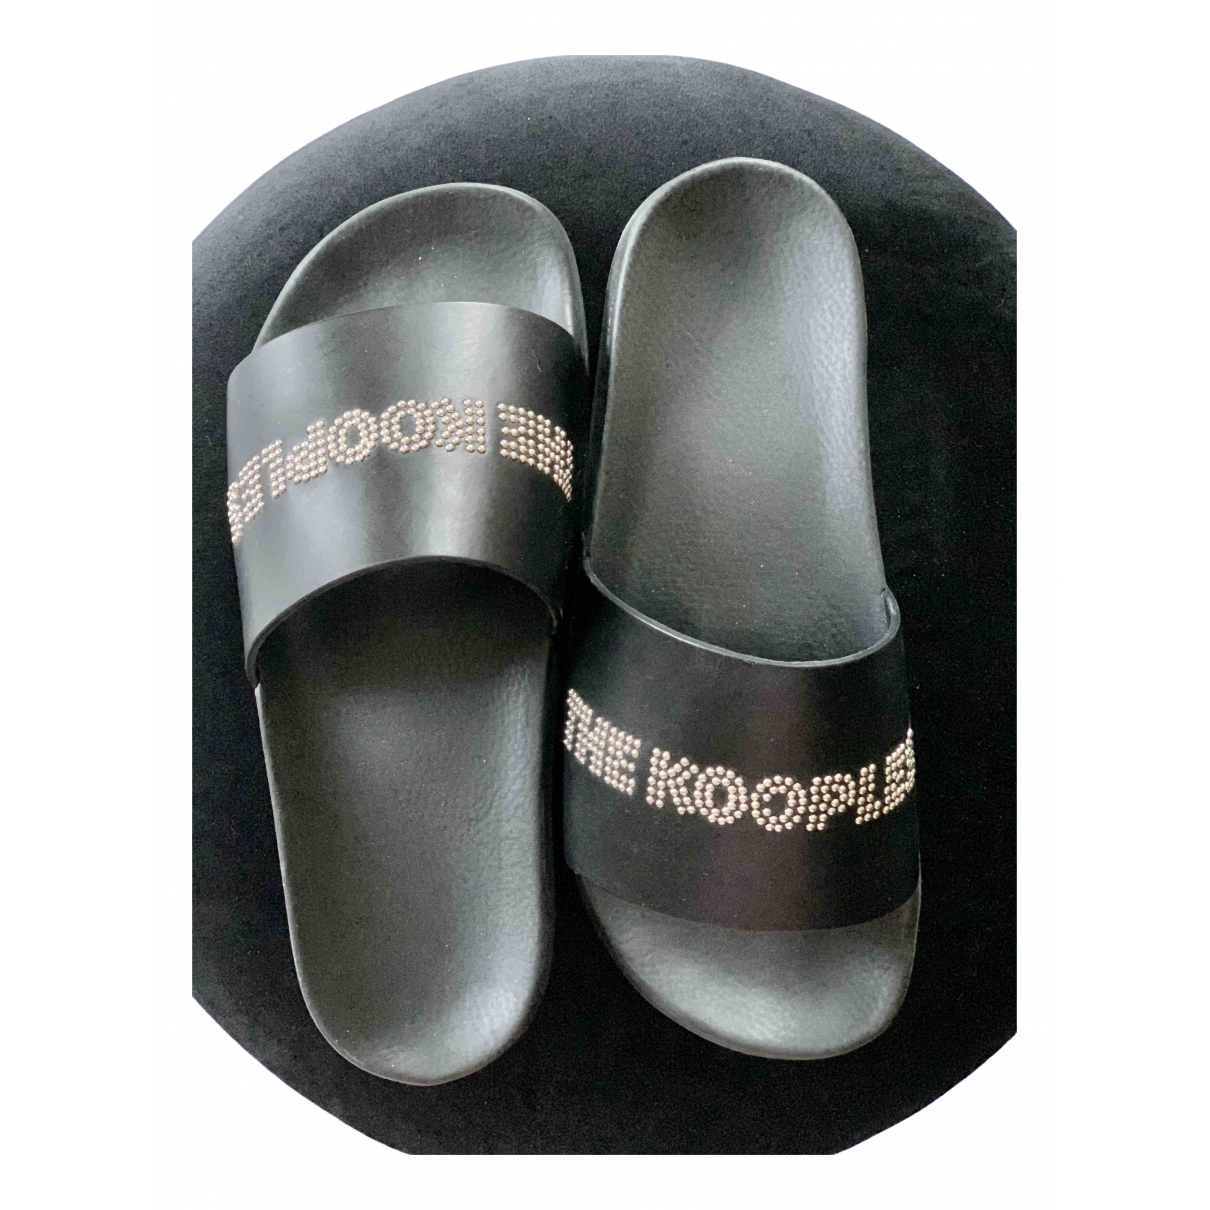 The Kooples Spring Summer 2020 Black Leather Sandals for Women 39 EU